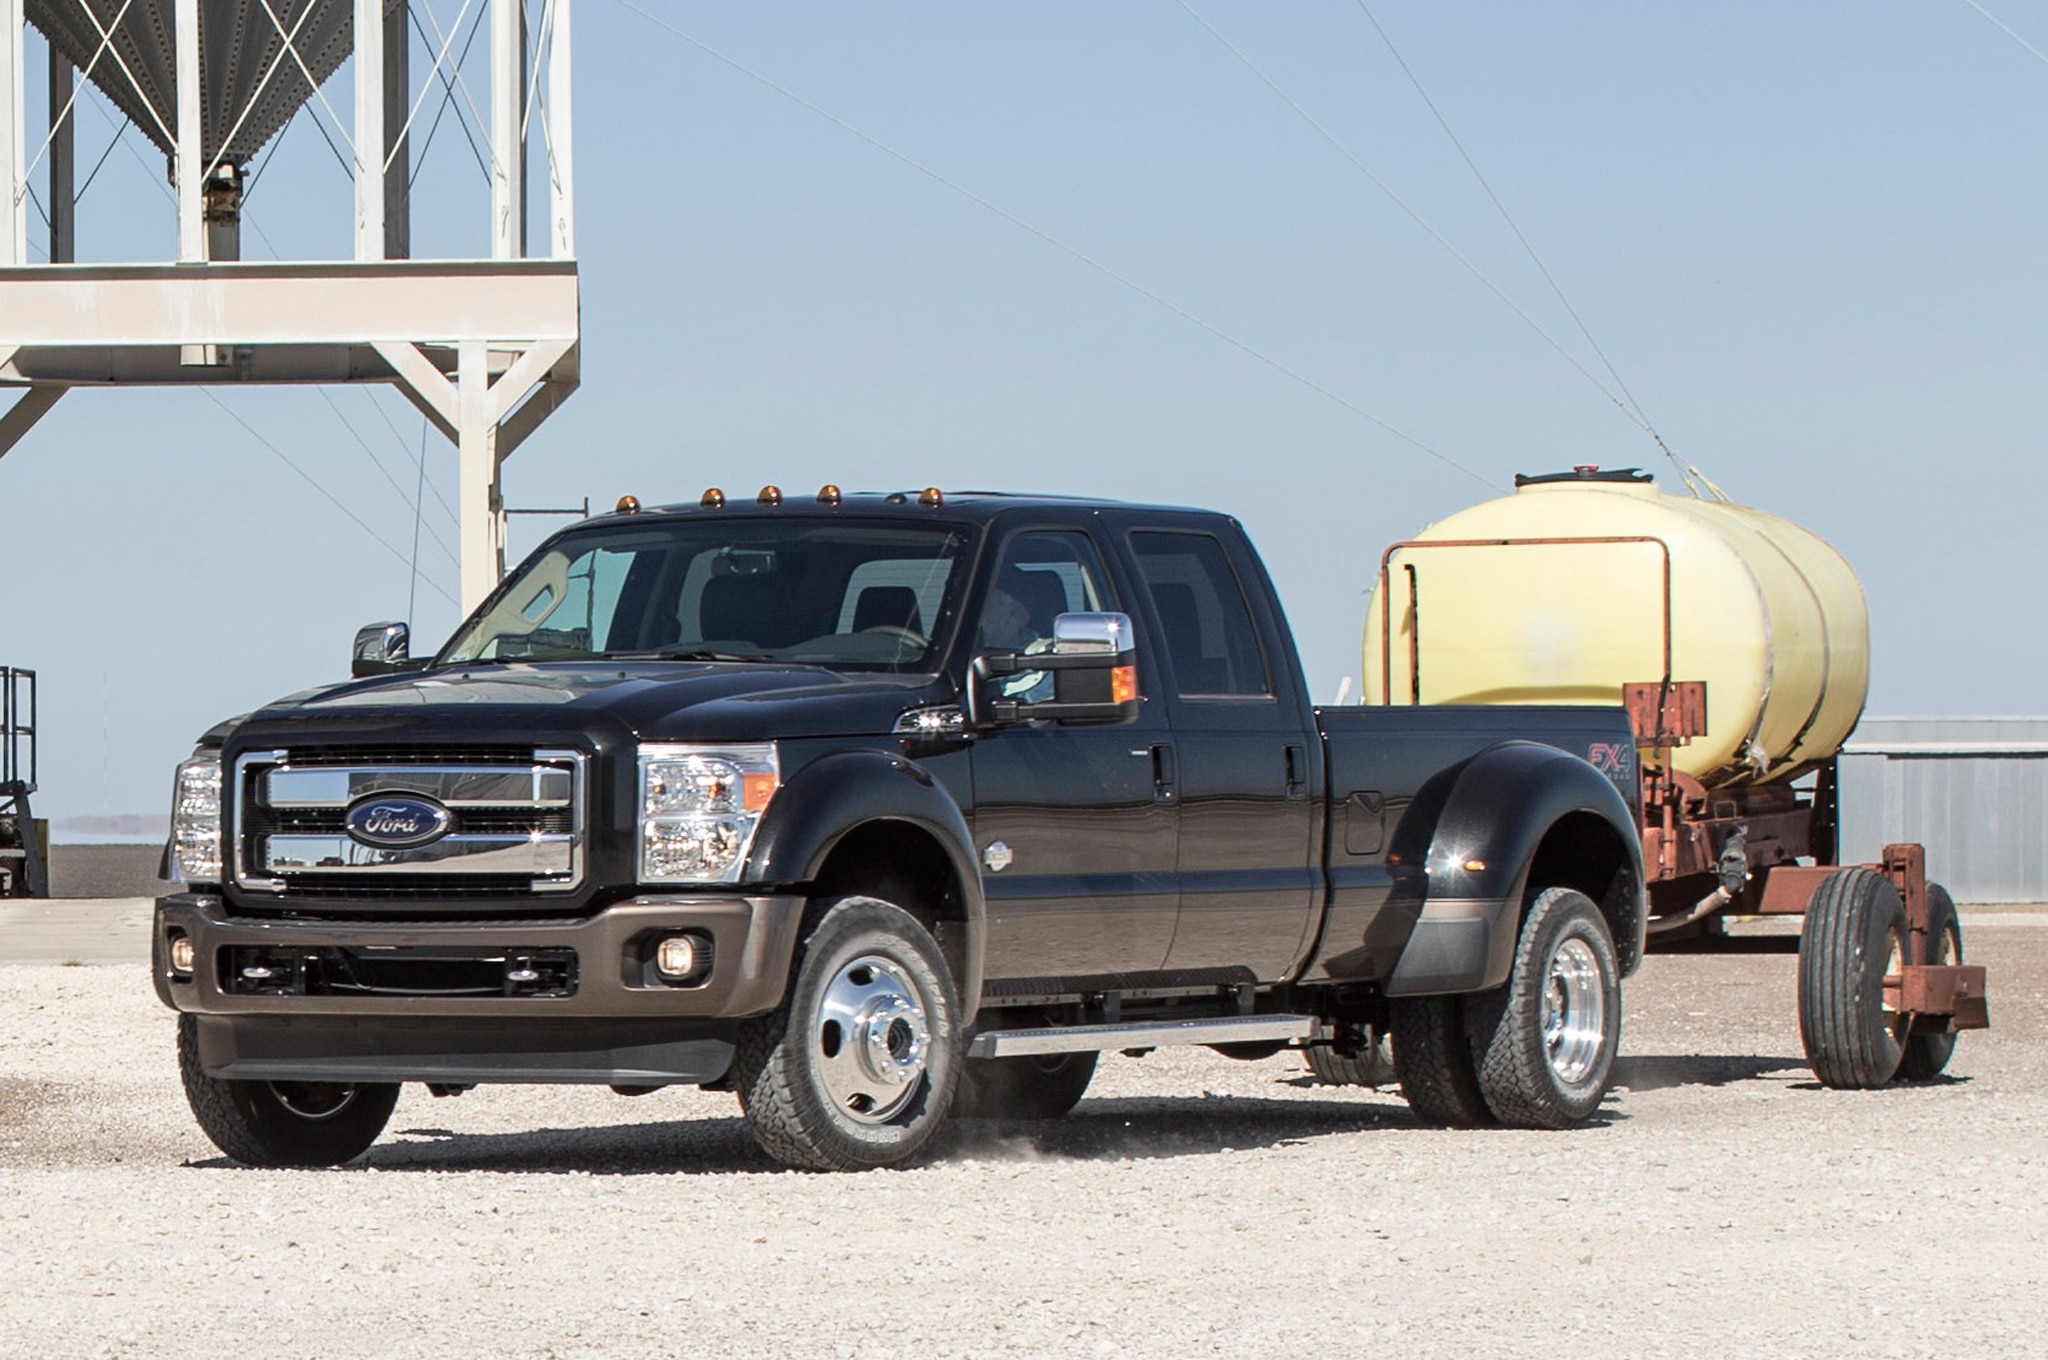 recalls saturn aura gm crossovers ford heavy duty trucks. Black Bedroom Furniture Sets. Home Design Ideas